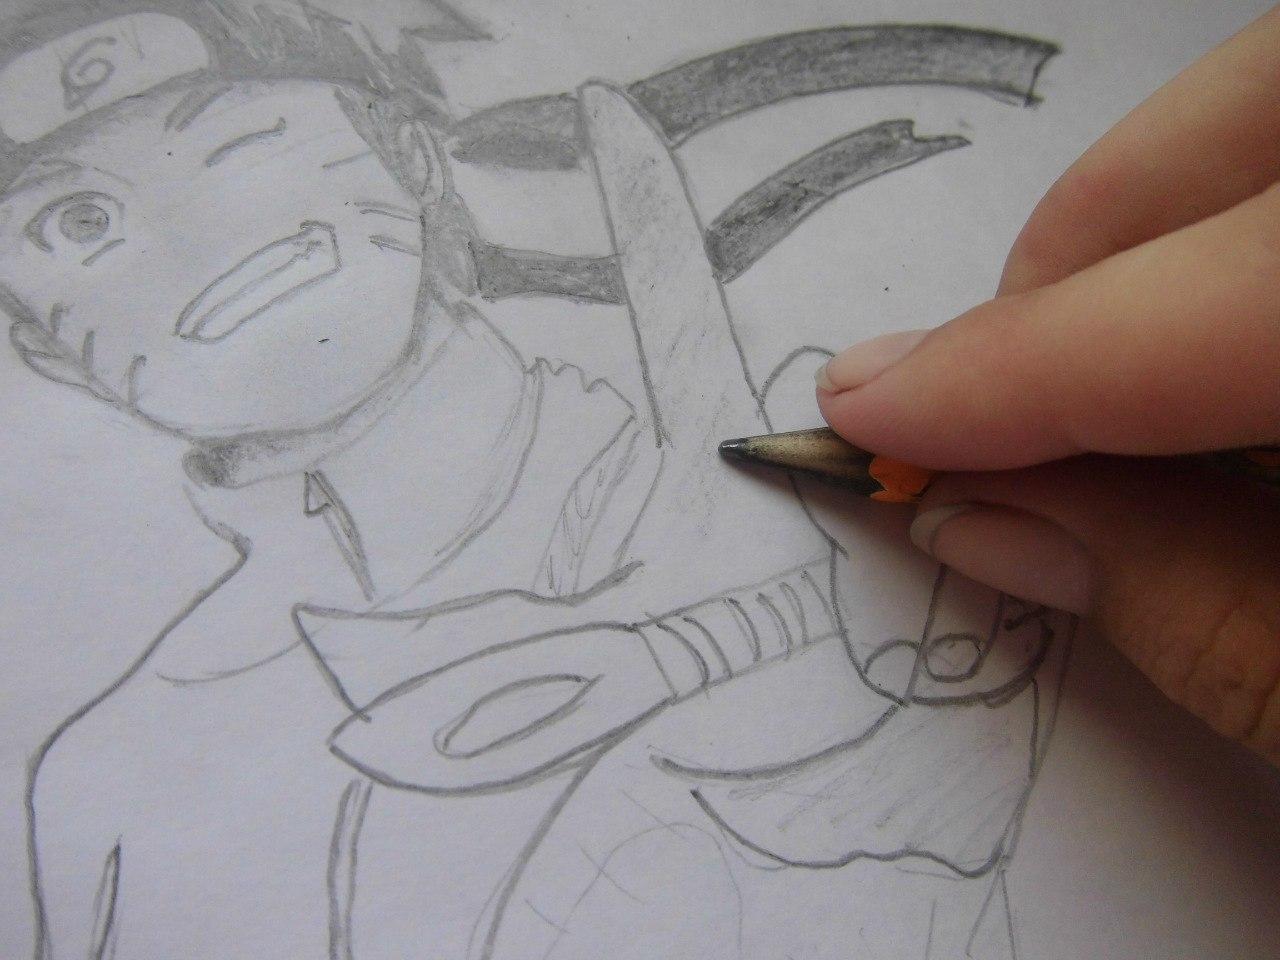 Картинки нарисовать своими руками карандашом